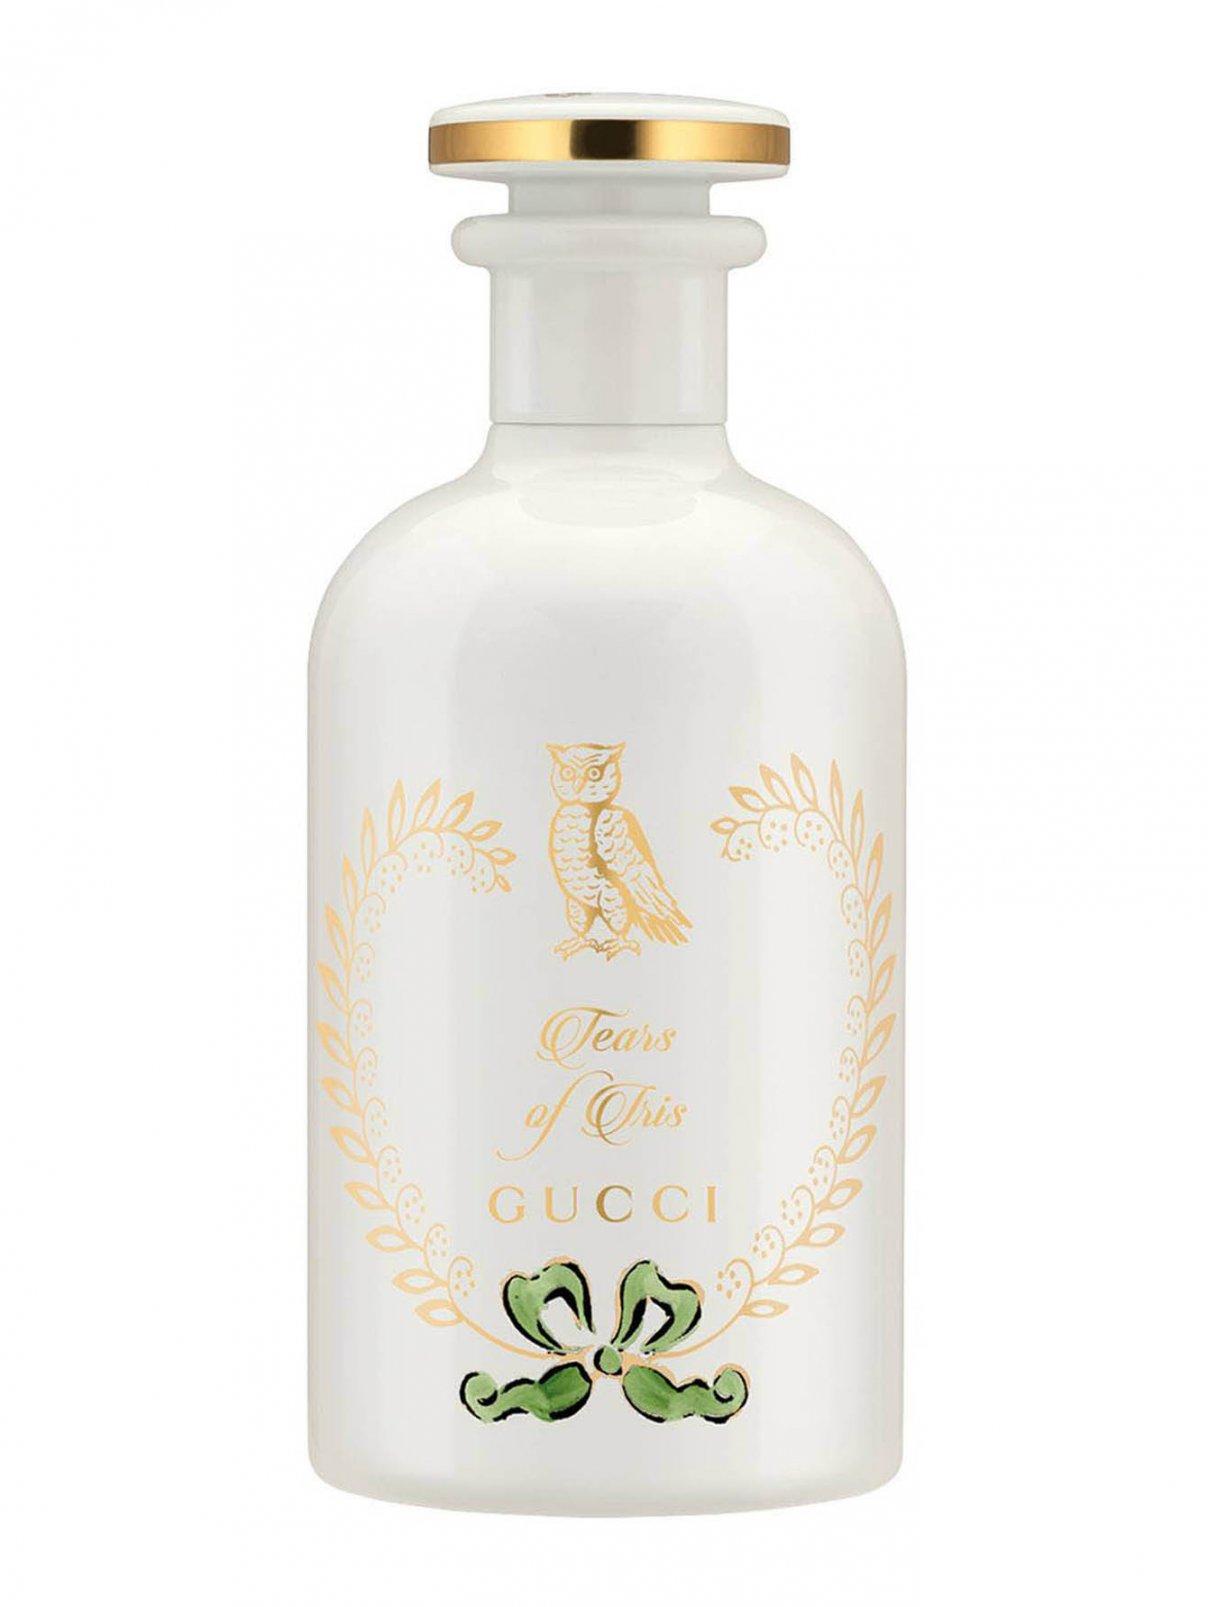 Парфюмерная вода 100 мл Tears of Iris Garden Gucci  –  Общий вид